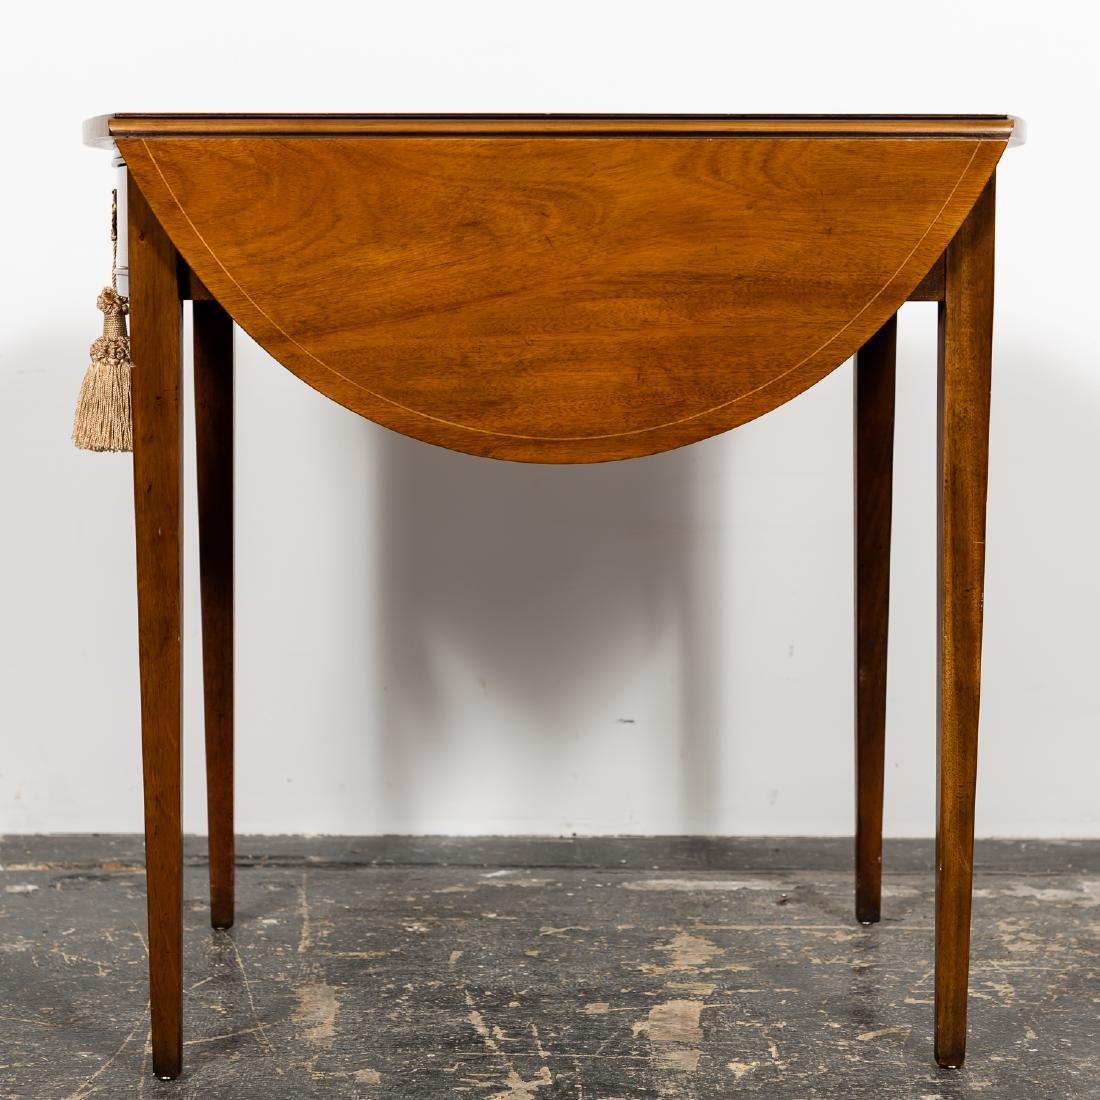 Baker Sheraton Style Inlaid Pembroke Table - 4